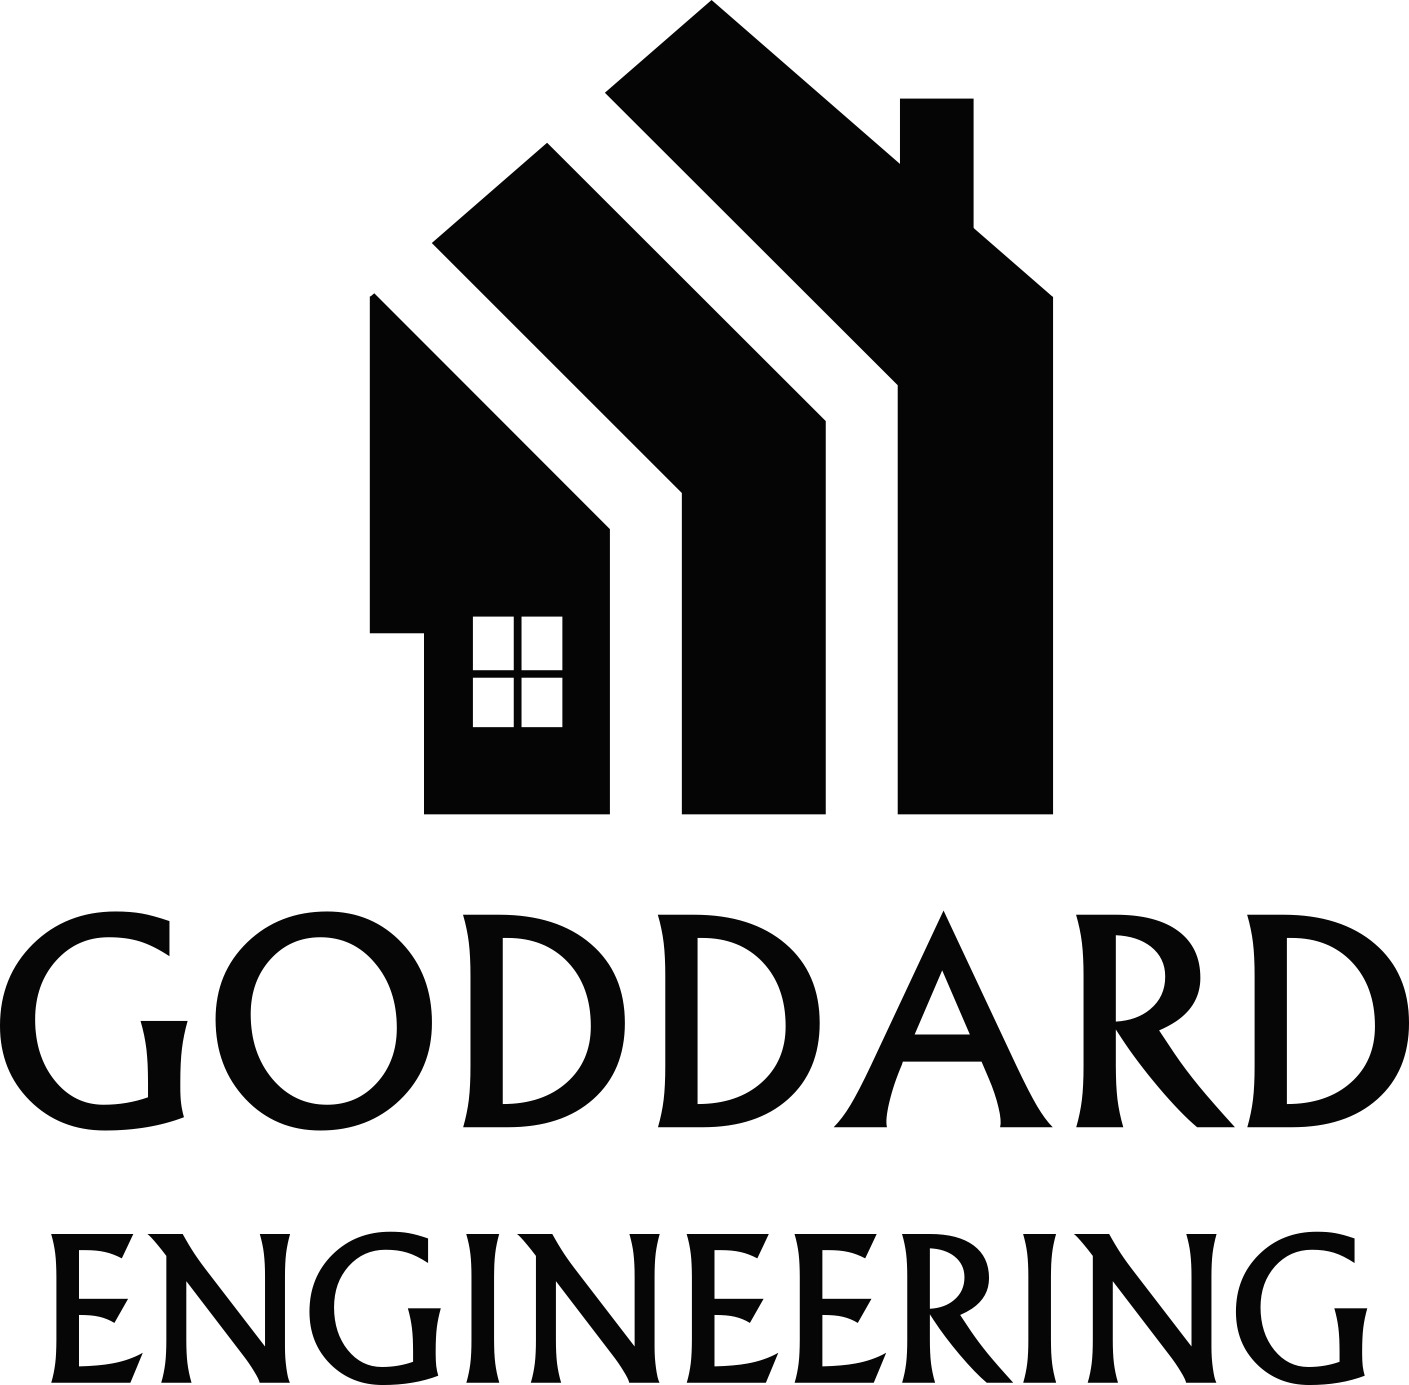 Goddard Engineering